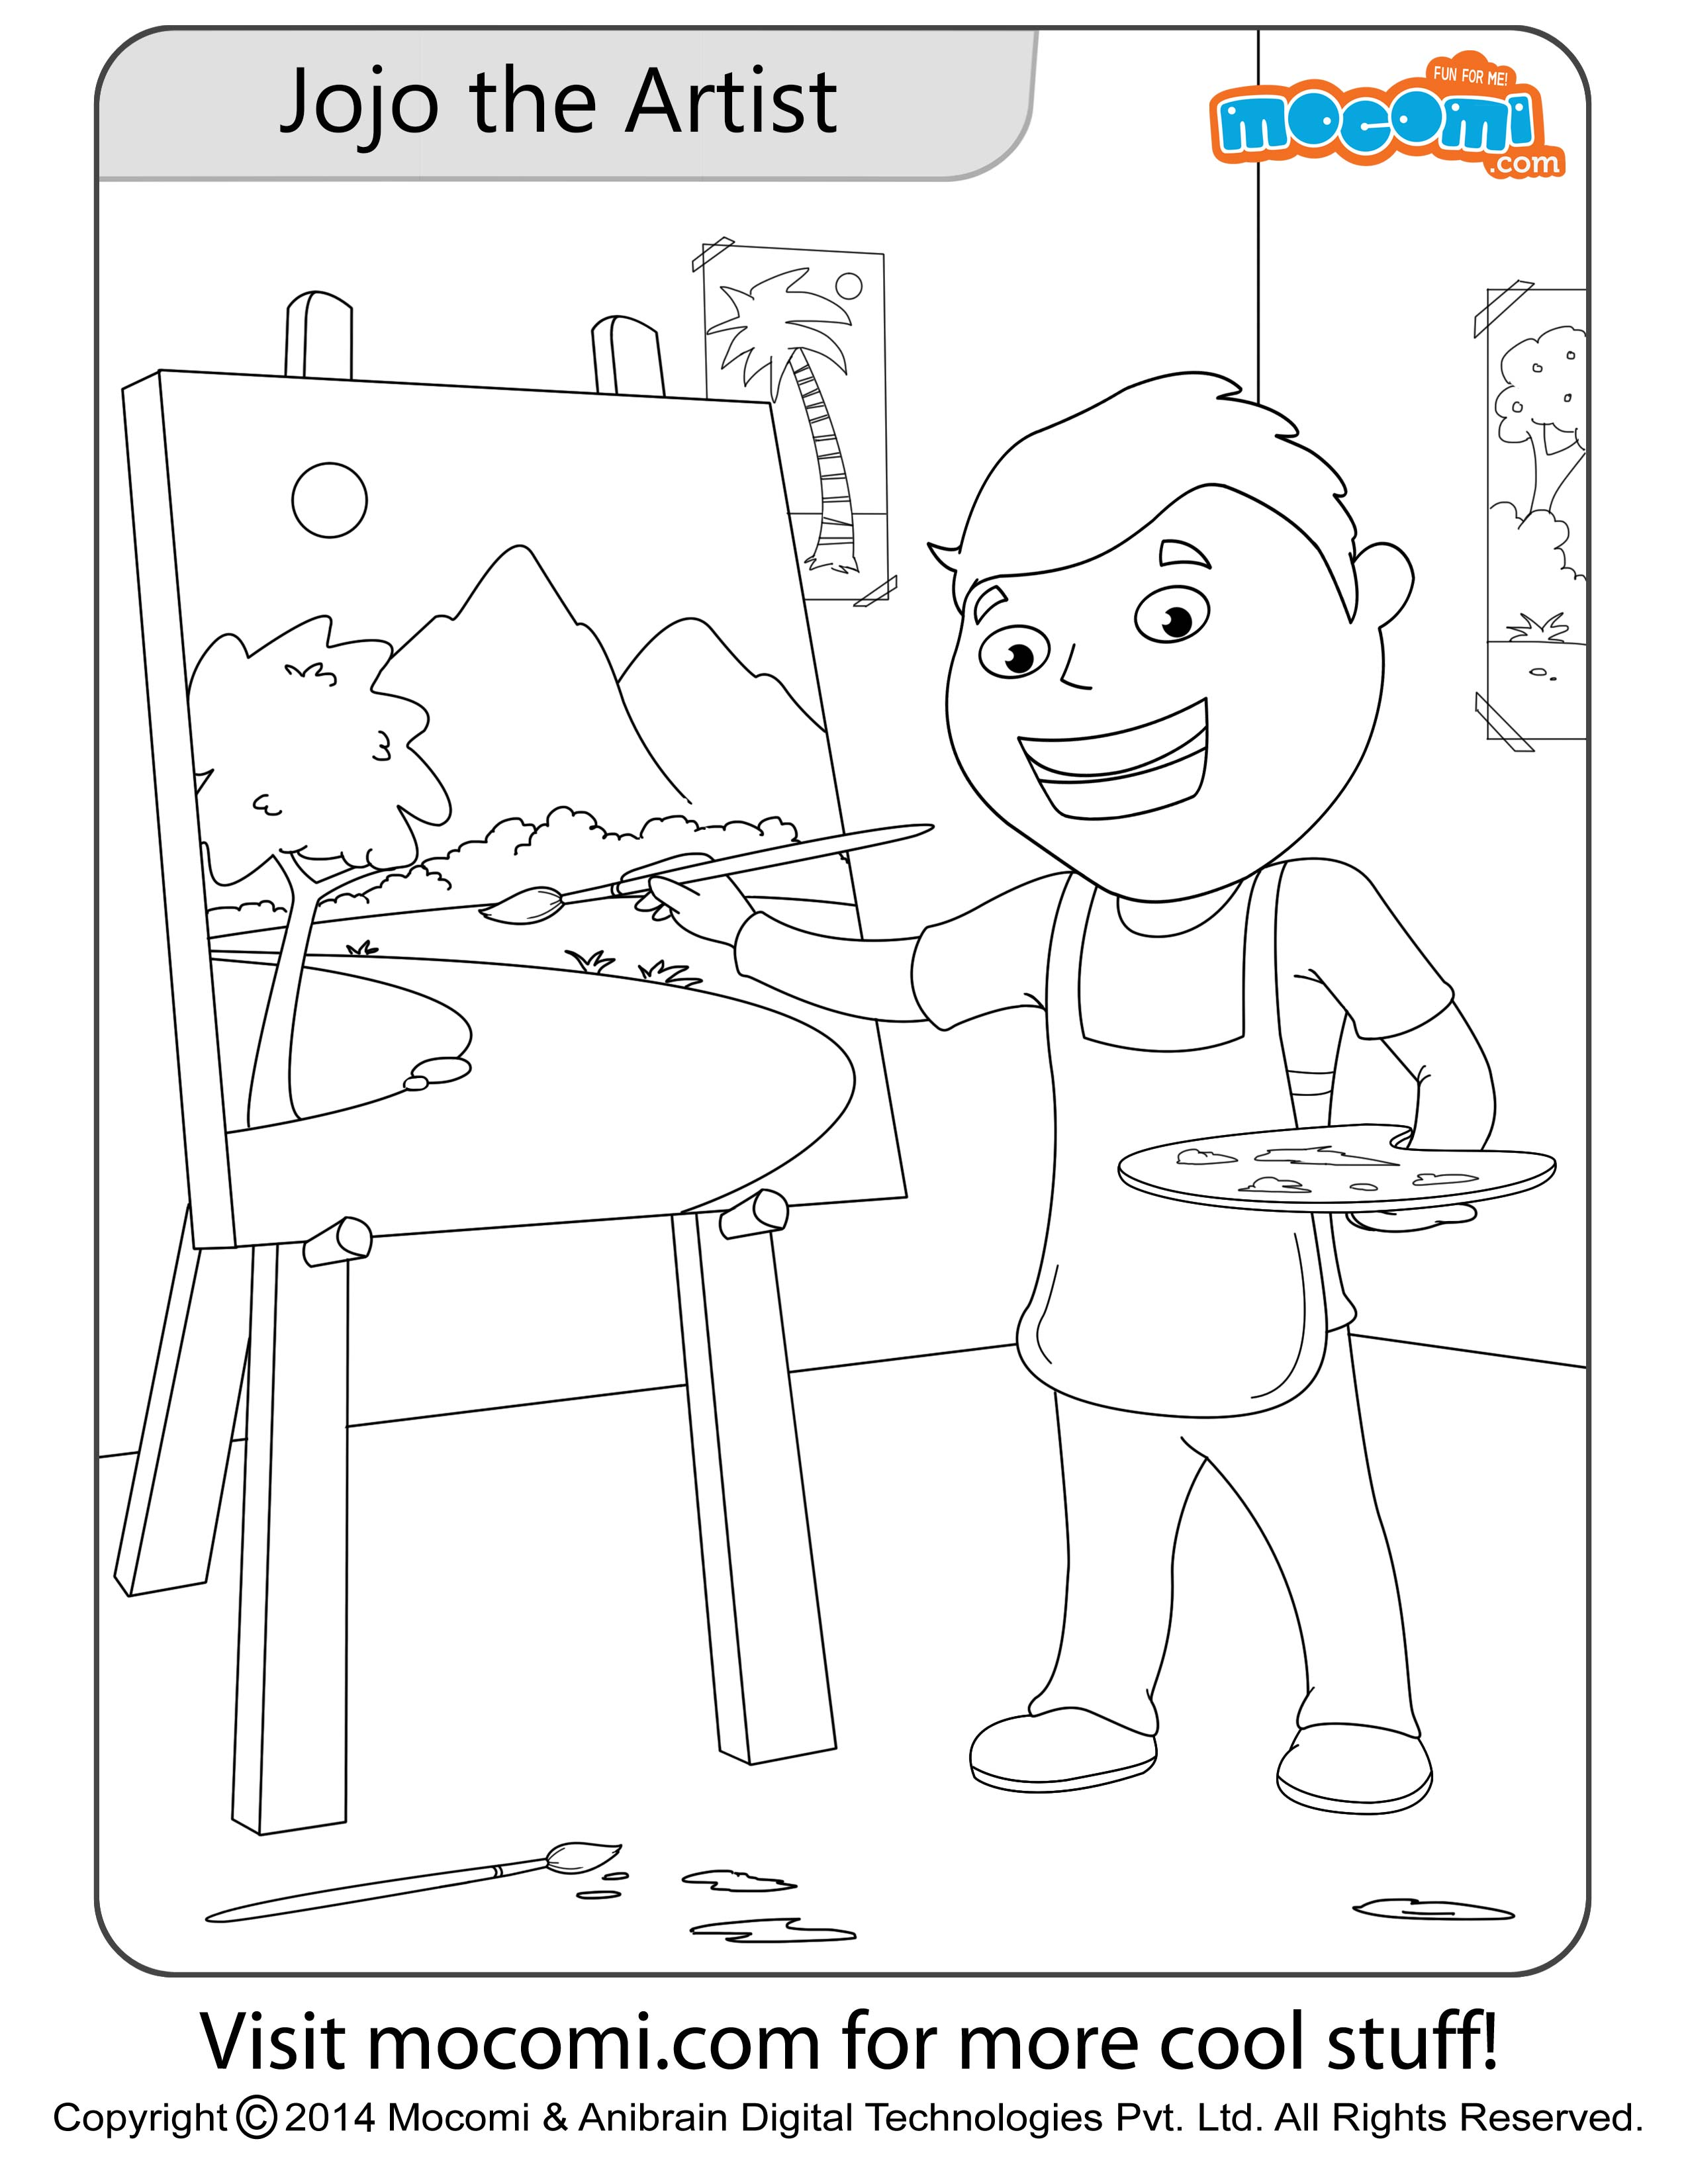 Jojo the Artist